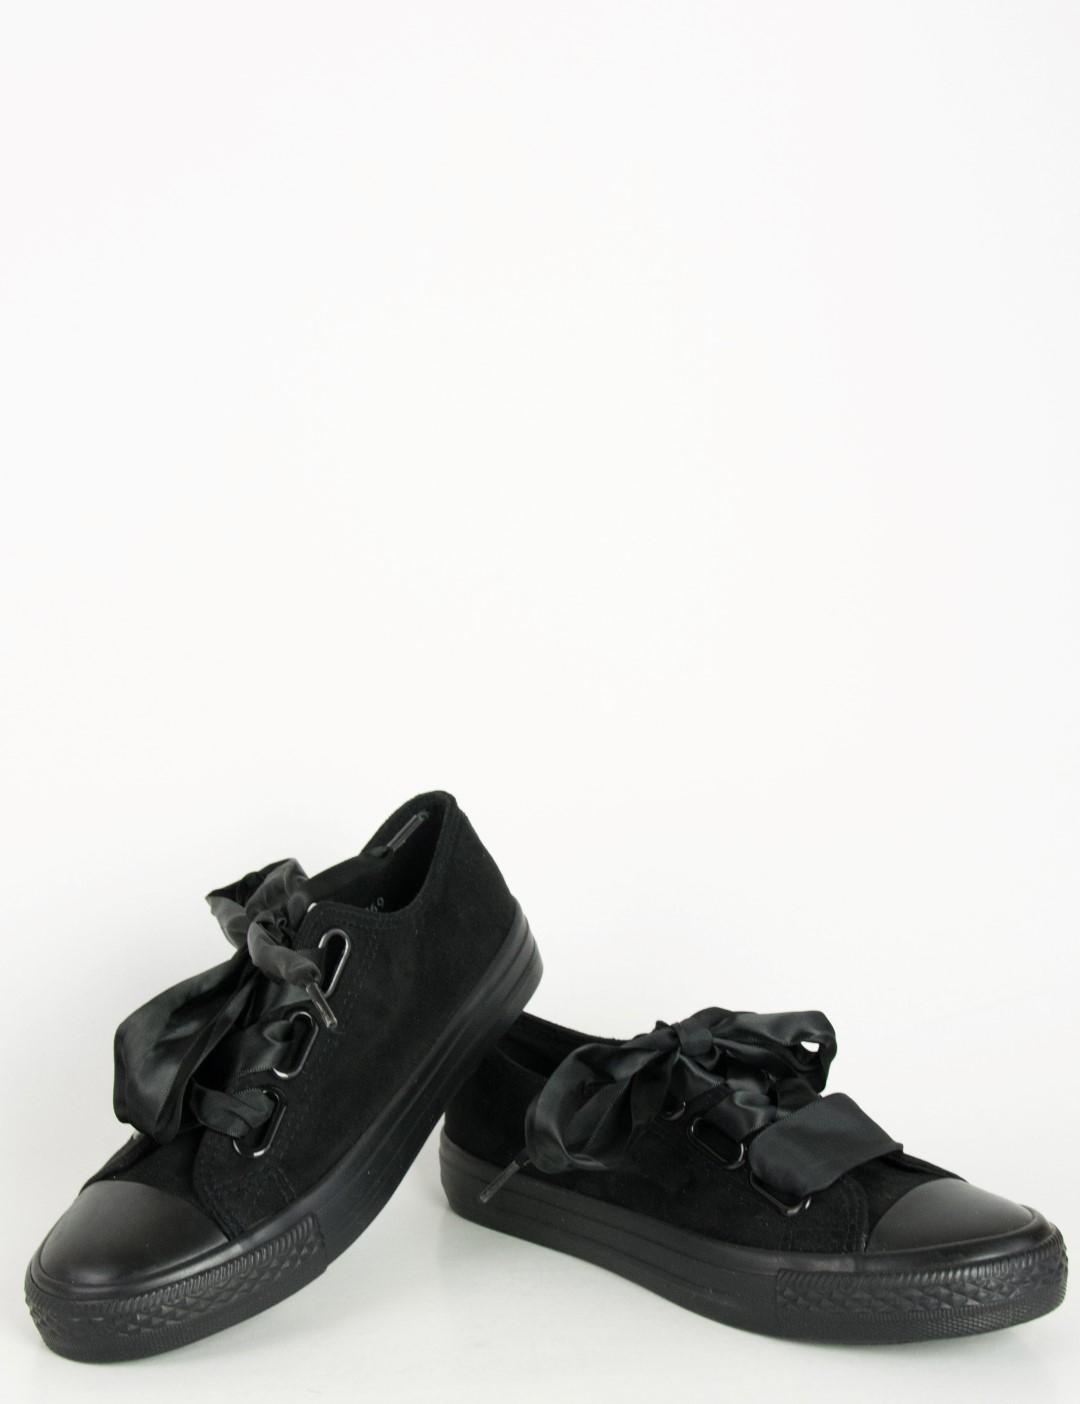 3ed74e2f38c Γυναικεία sneakers suede με σατέν κορδέλα μαύρα AD769